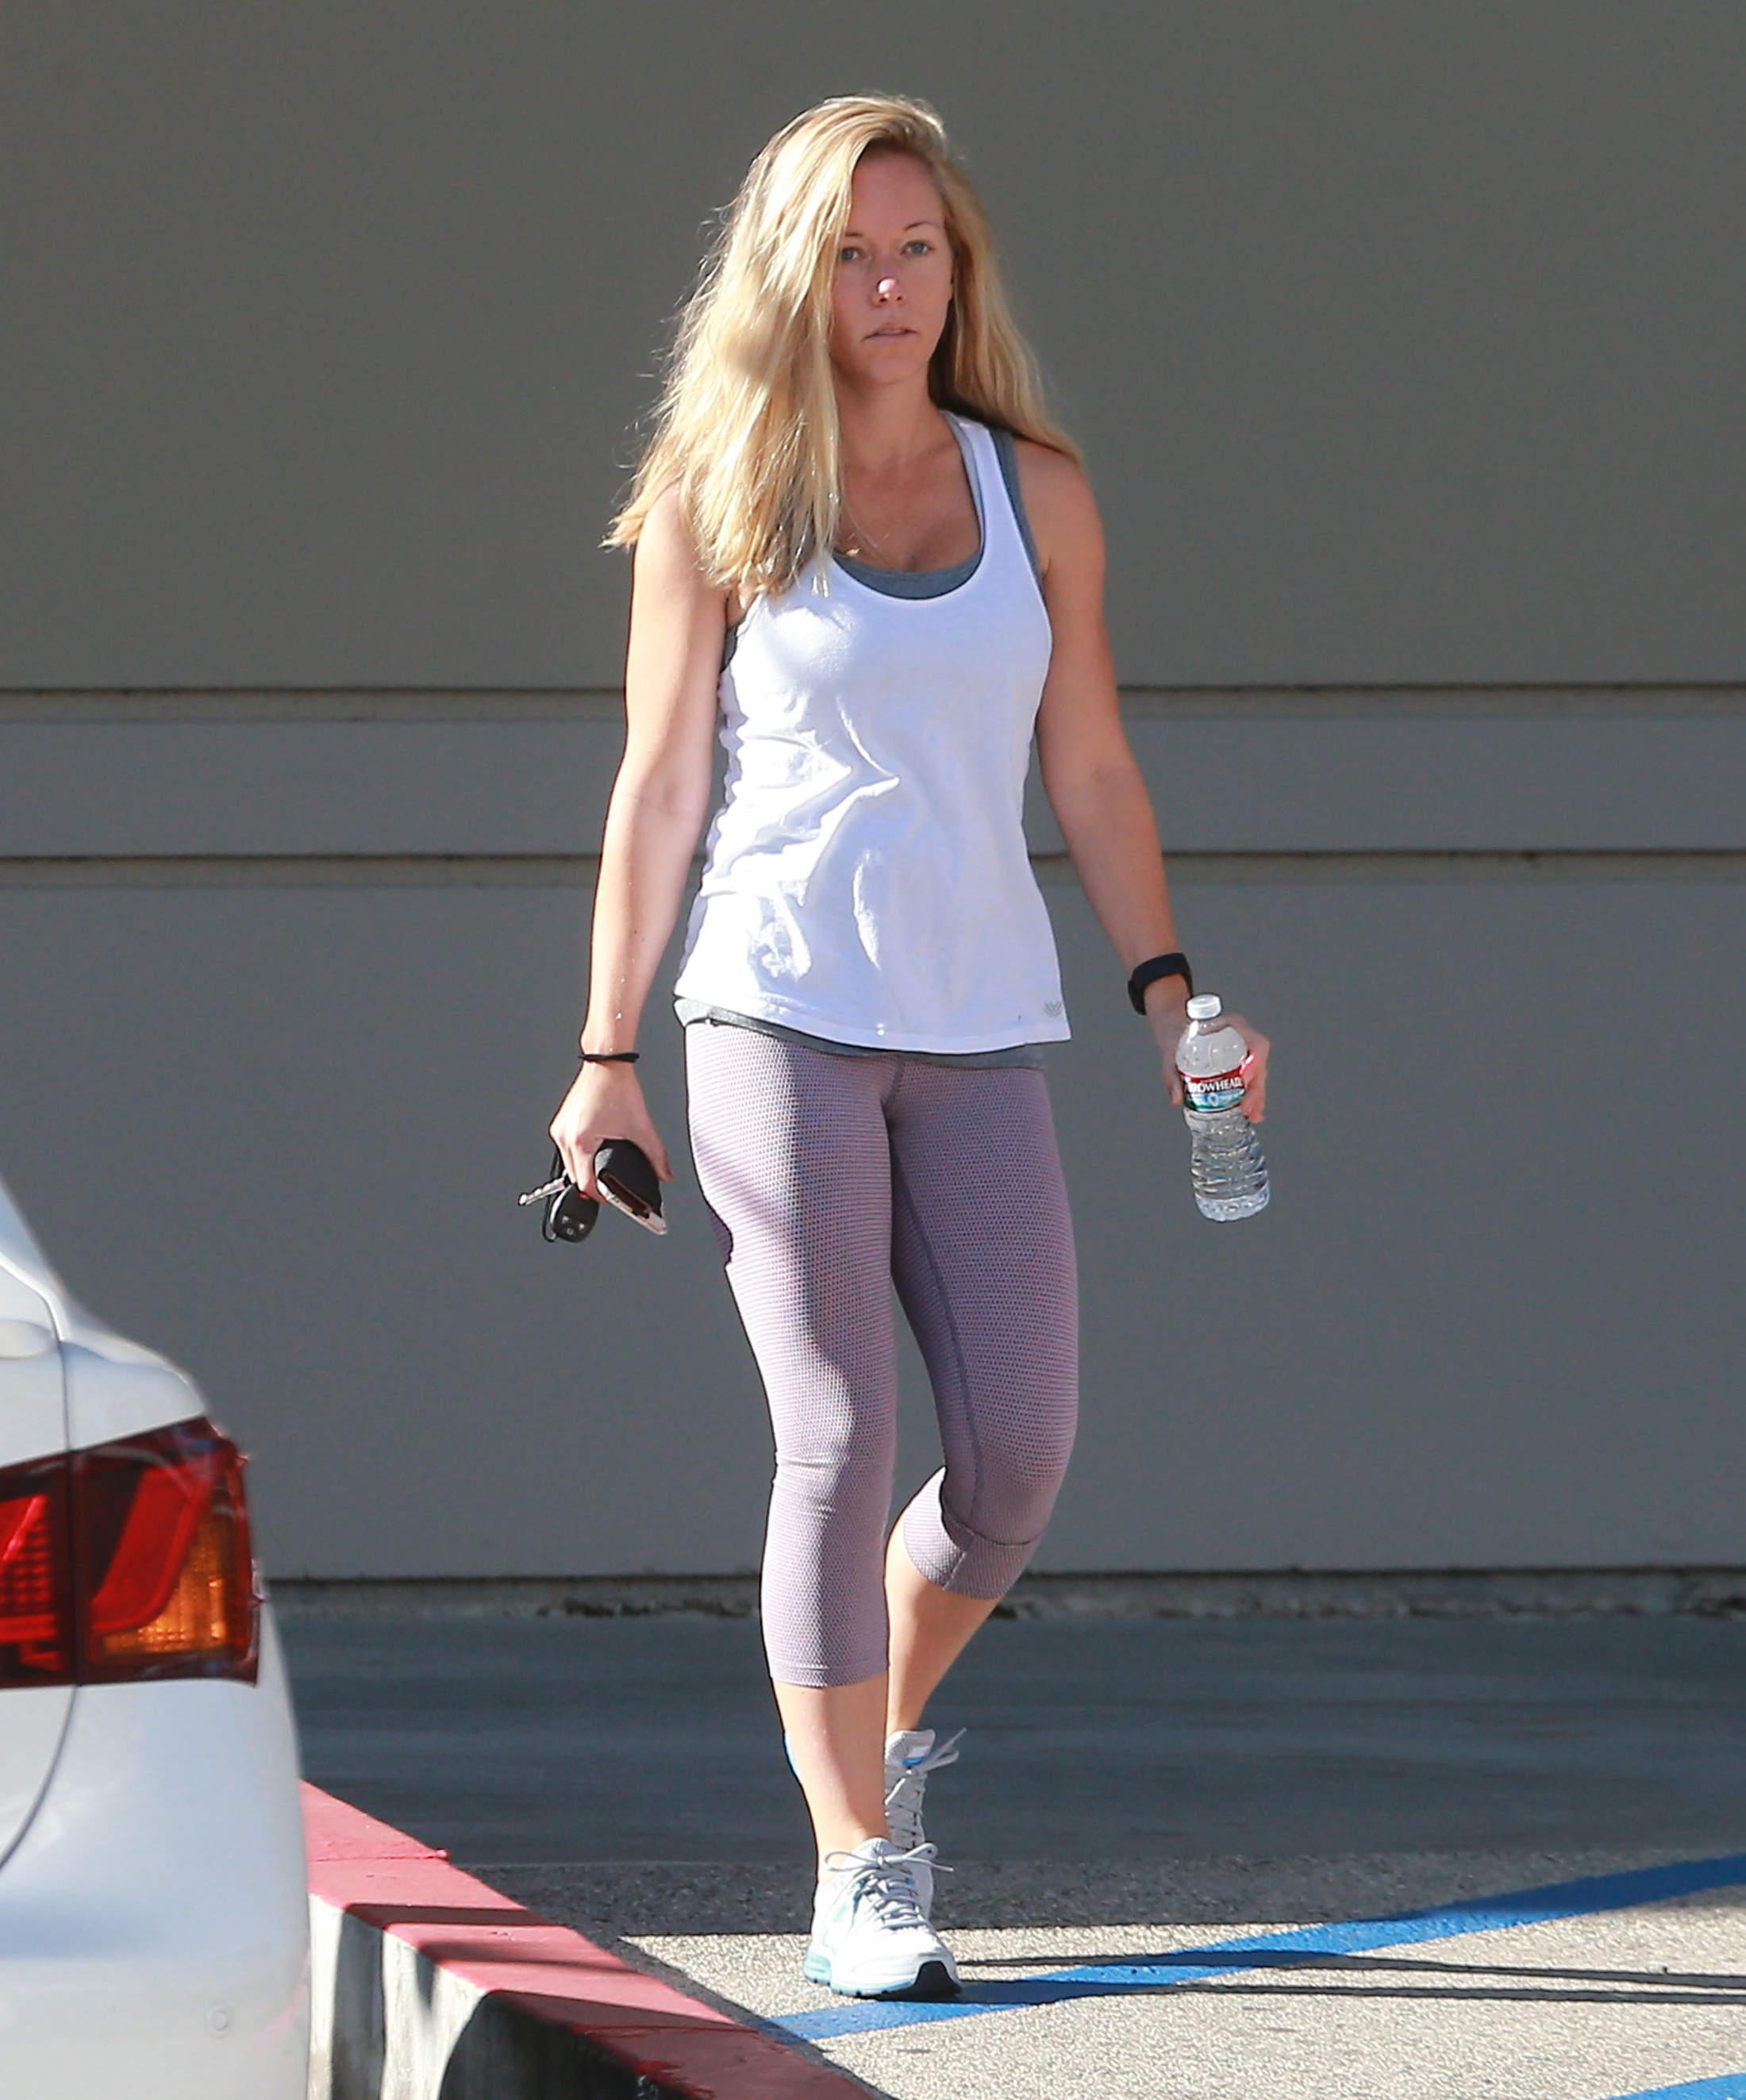 Kendra Wilkinson: Barefaced Beauty Kendra Wilkinson Hits The Gym